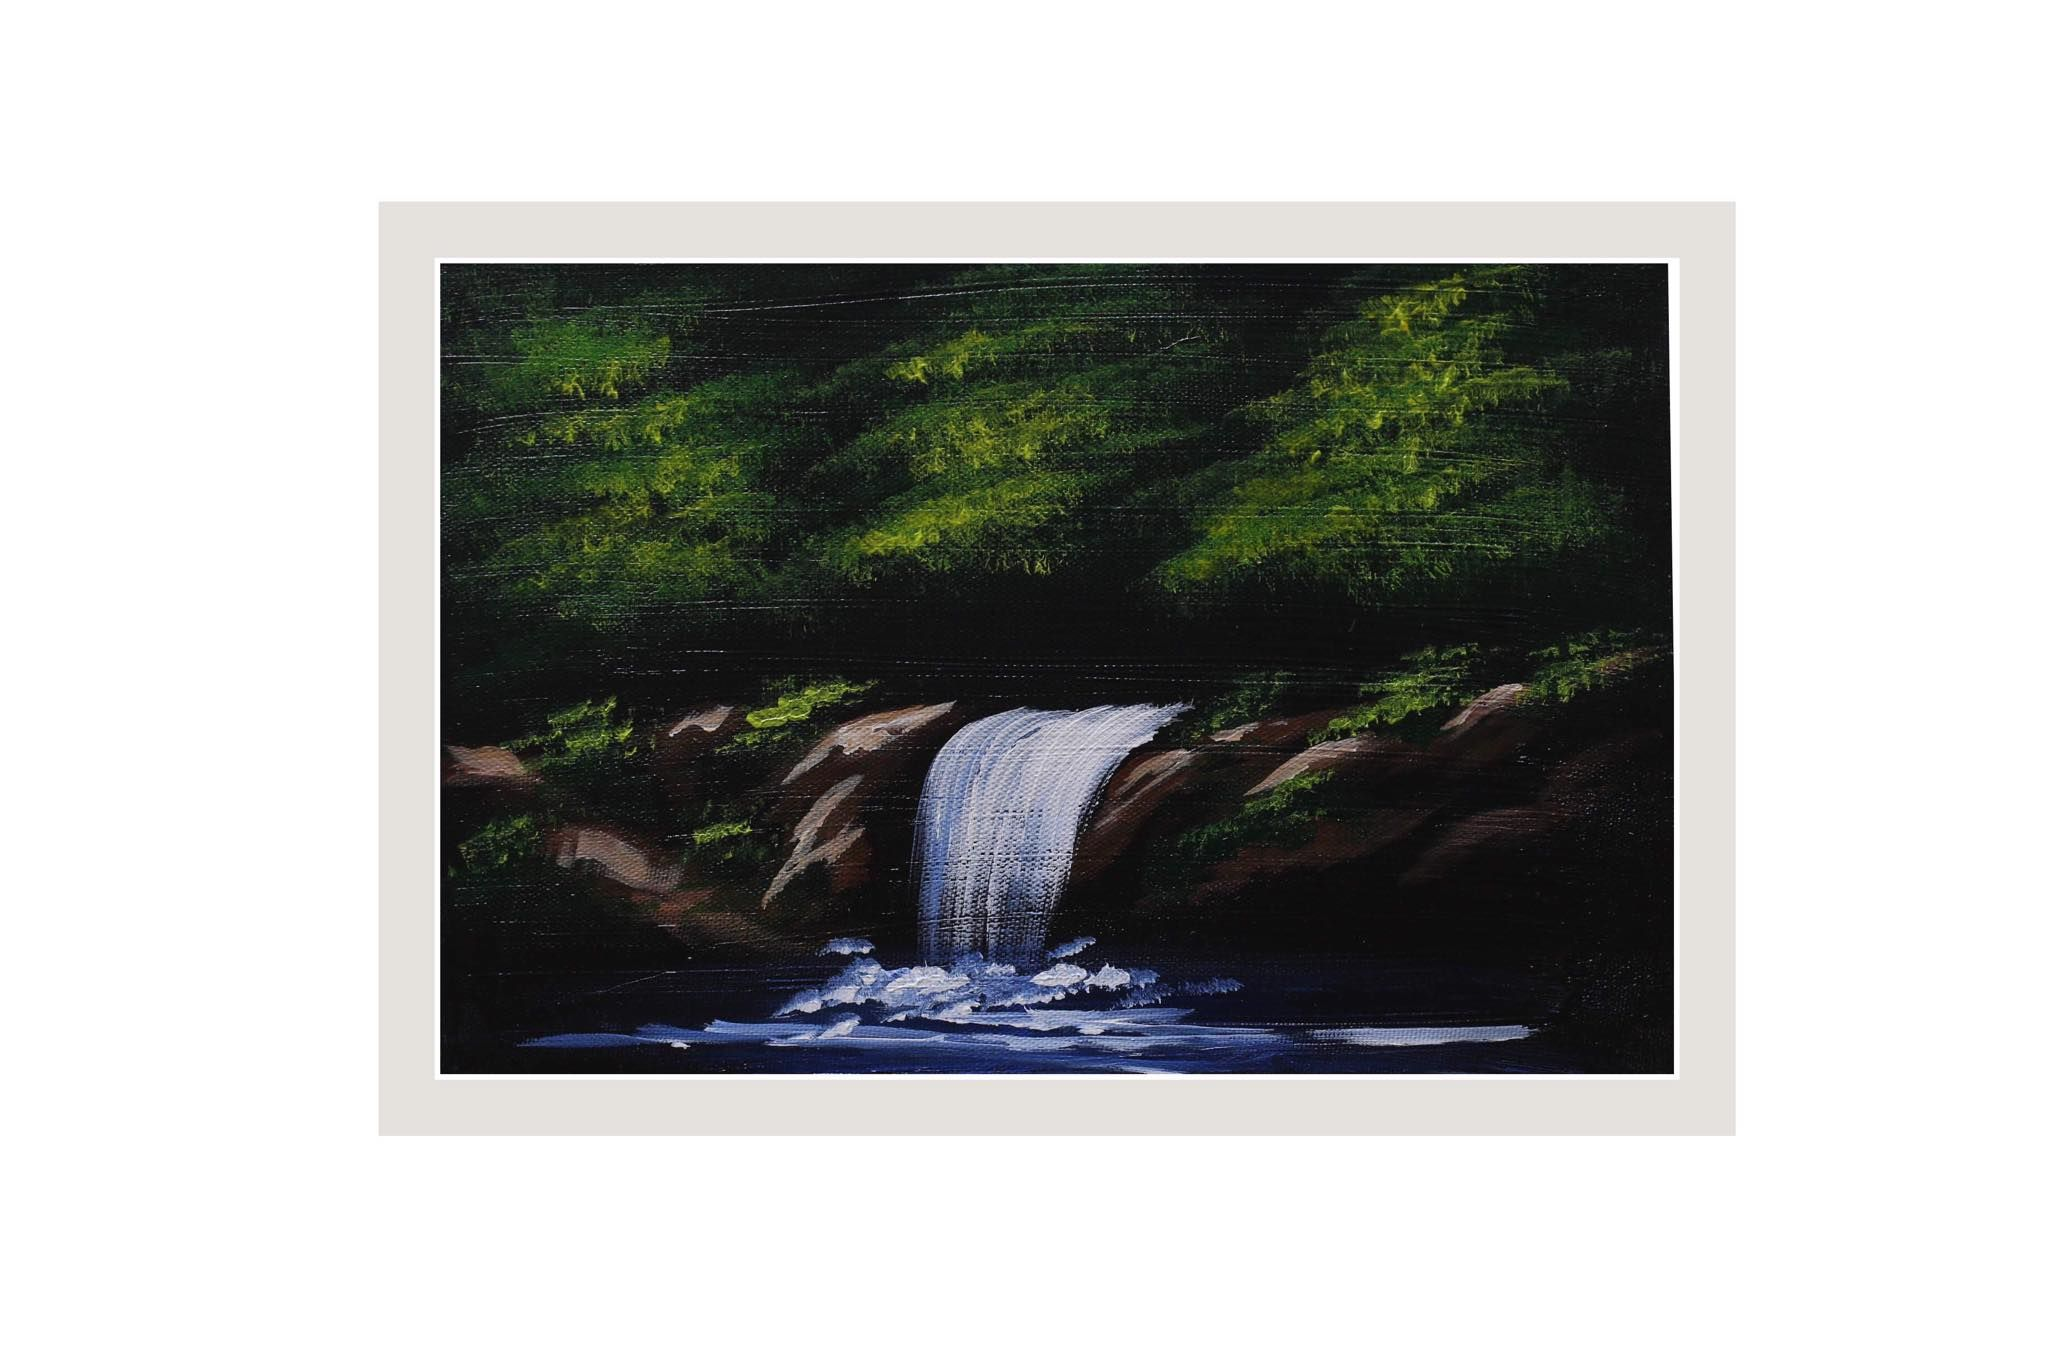 Waterfall Pines Waterfall Paintings Landscape Paintings Bob Ross Paintings